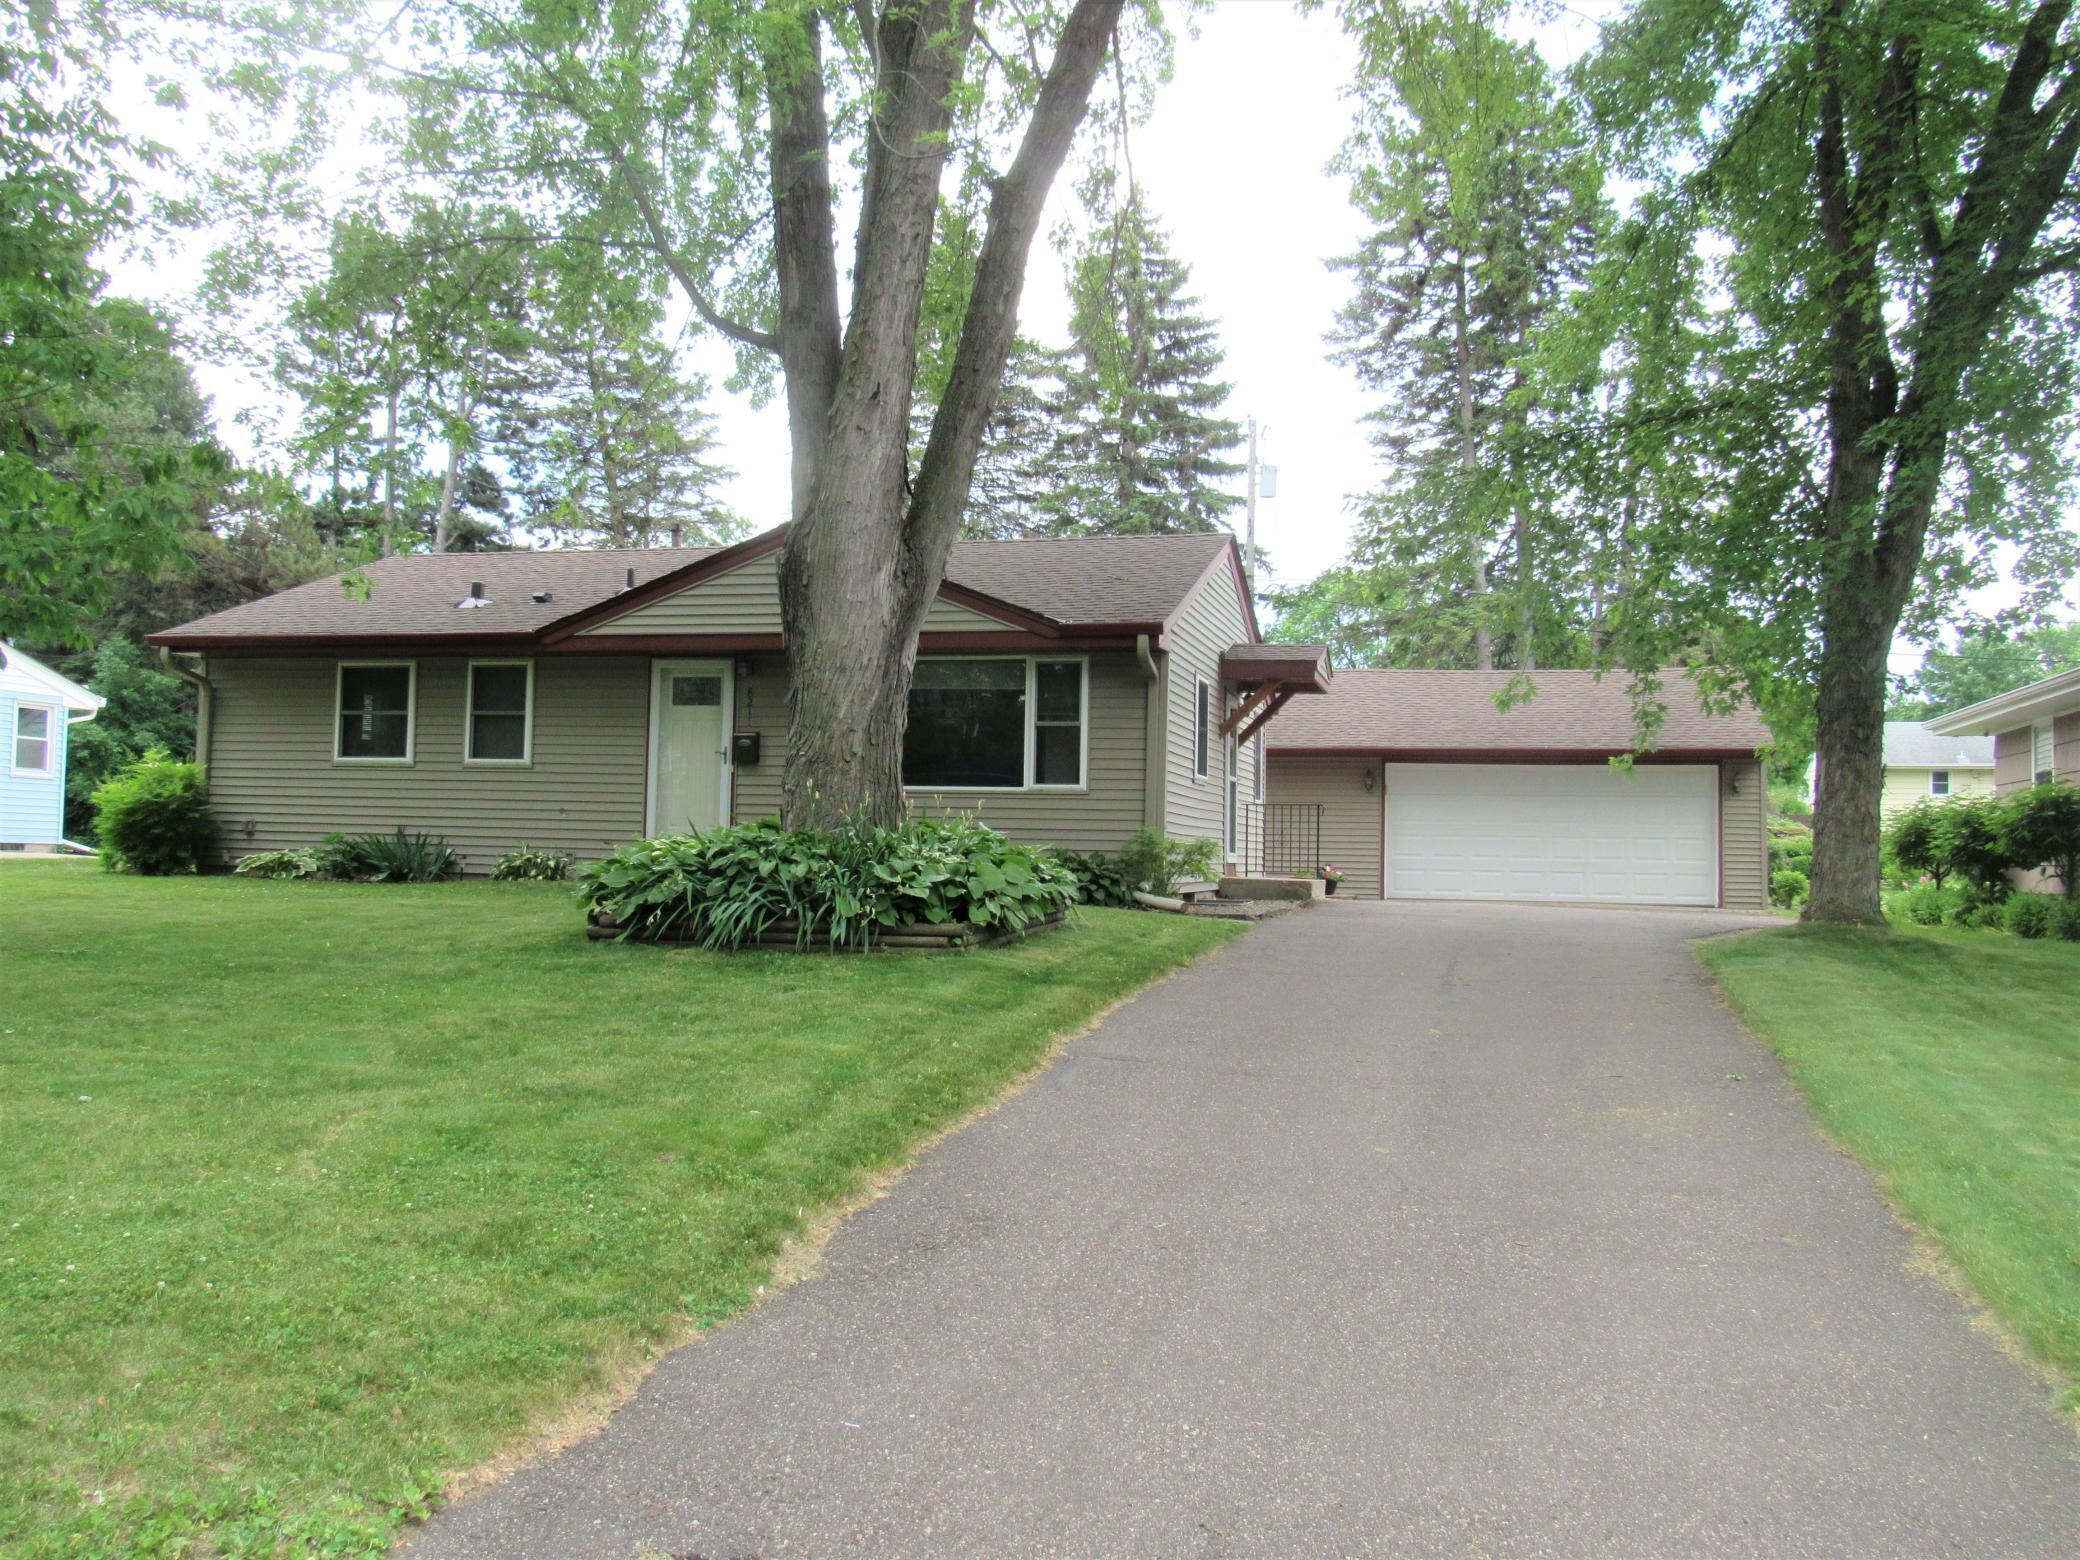 8211 34 1/2 Property Photo - Saint Louis Park, MN real estate listing